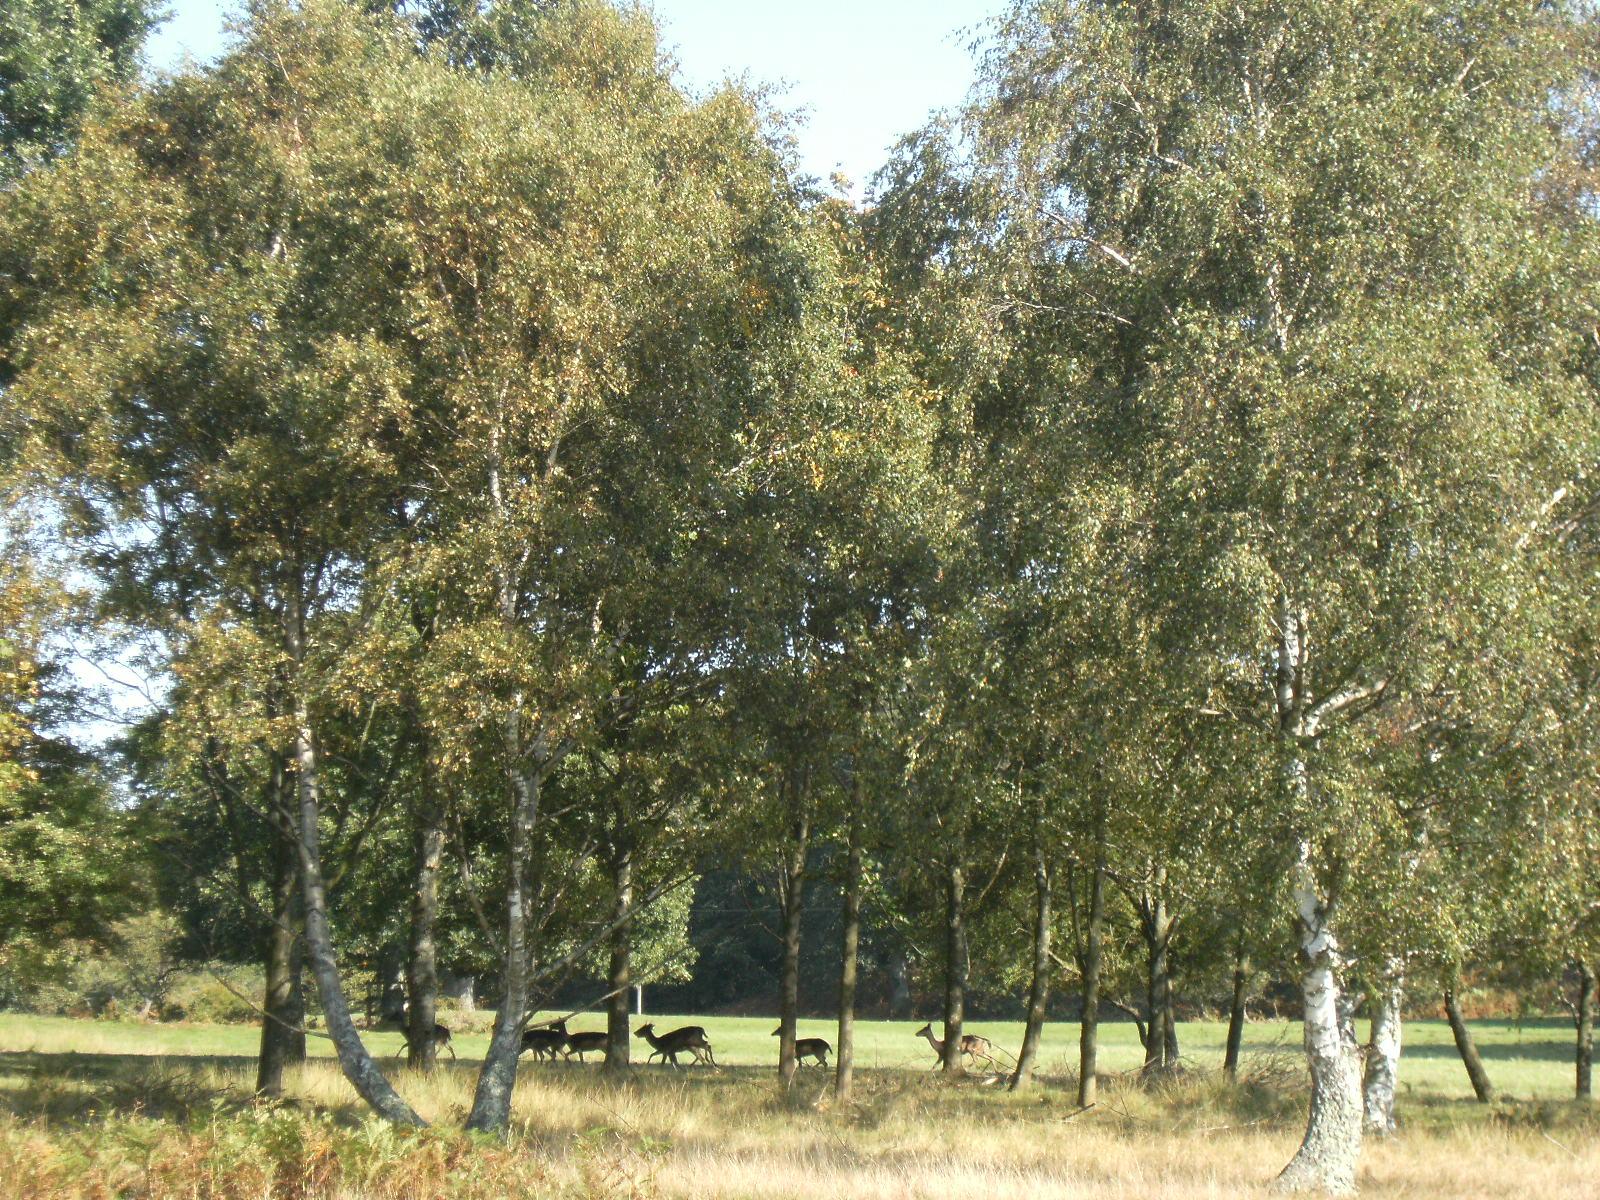 DSCF9933 Parham Park